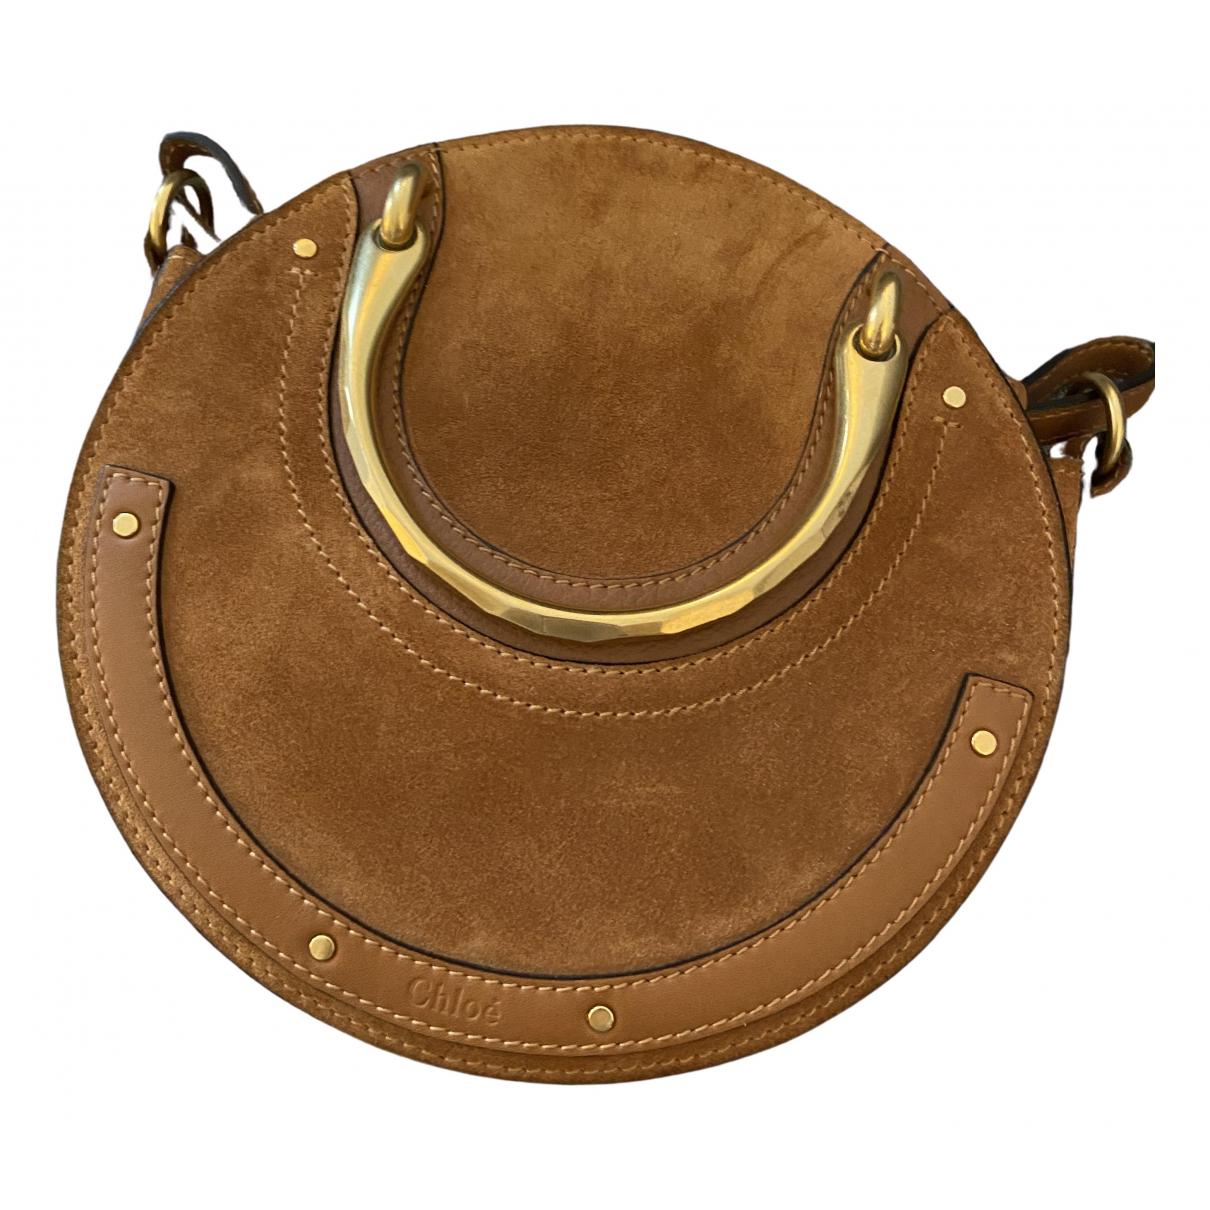 Chloé Pixie Brown Suede handbag for Women \N